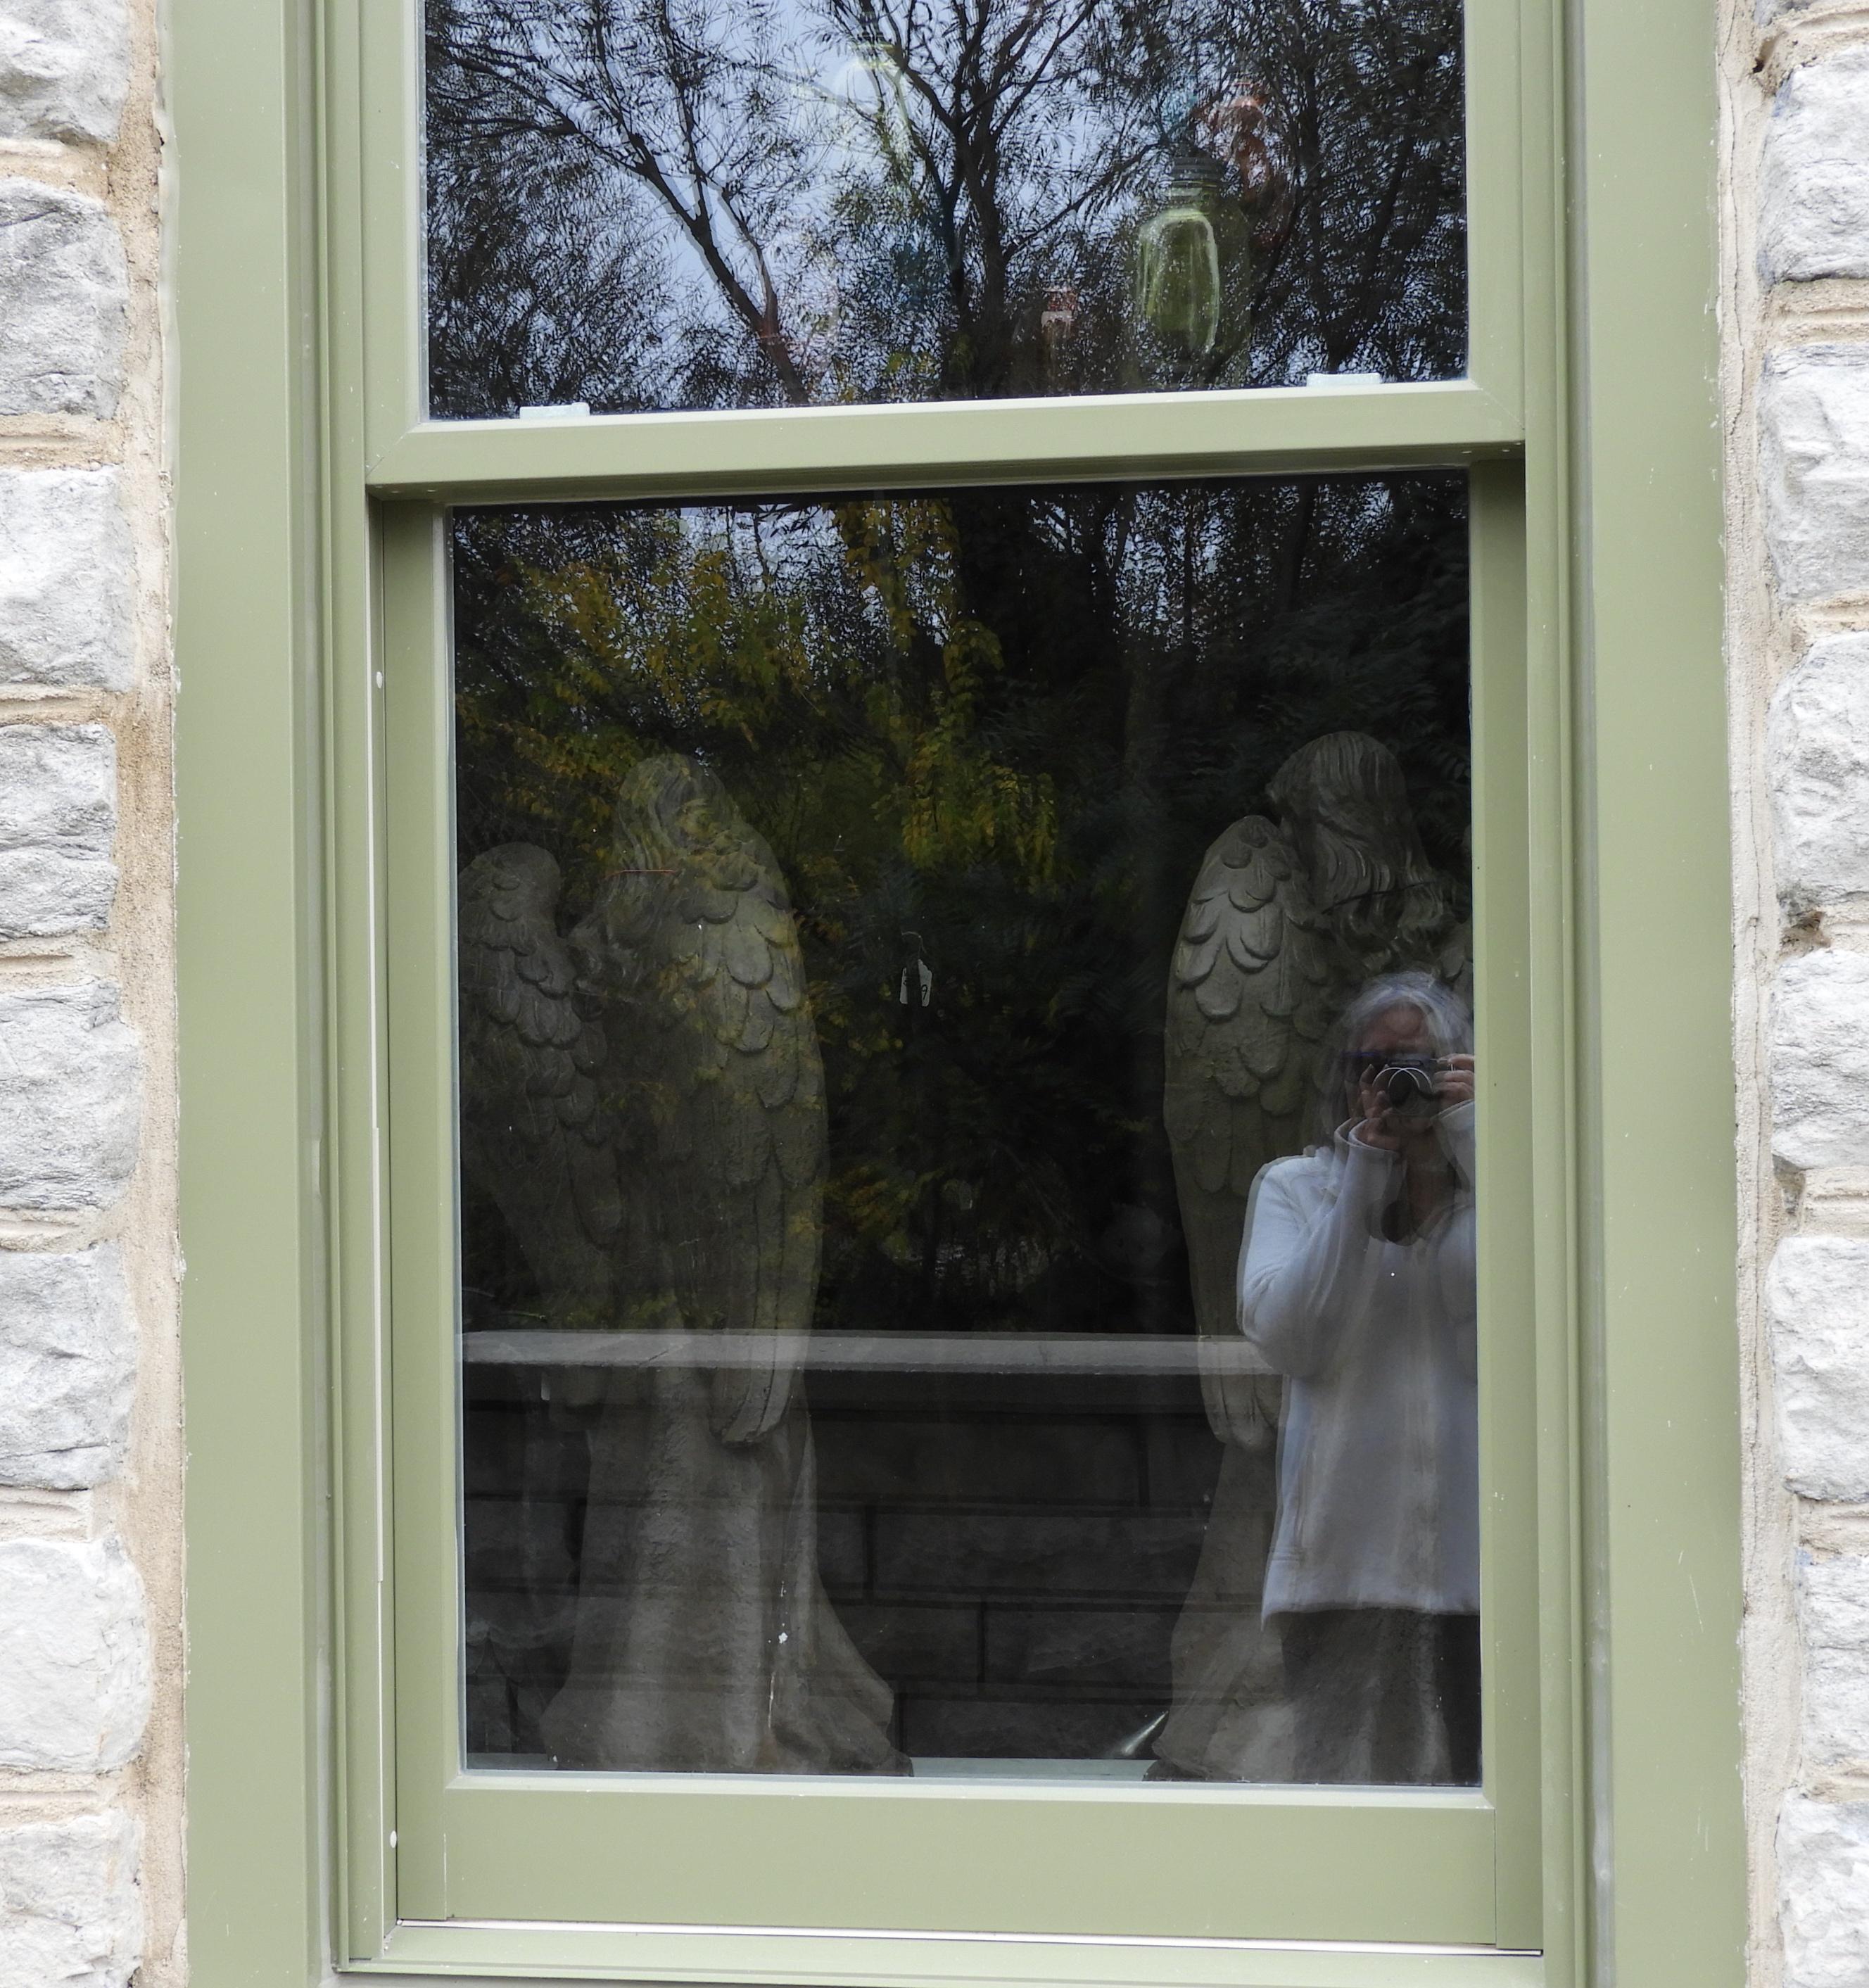 window, photographer